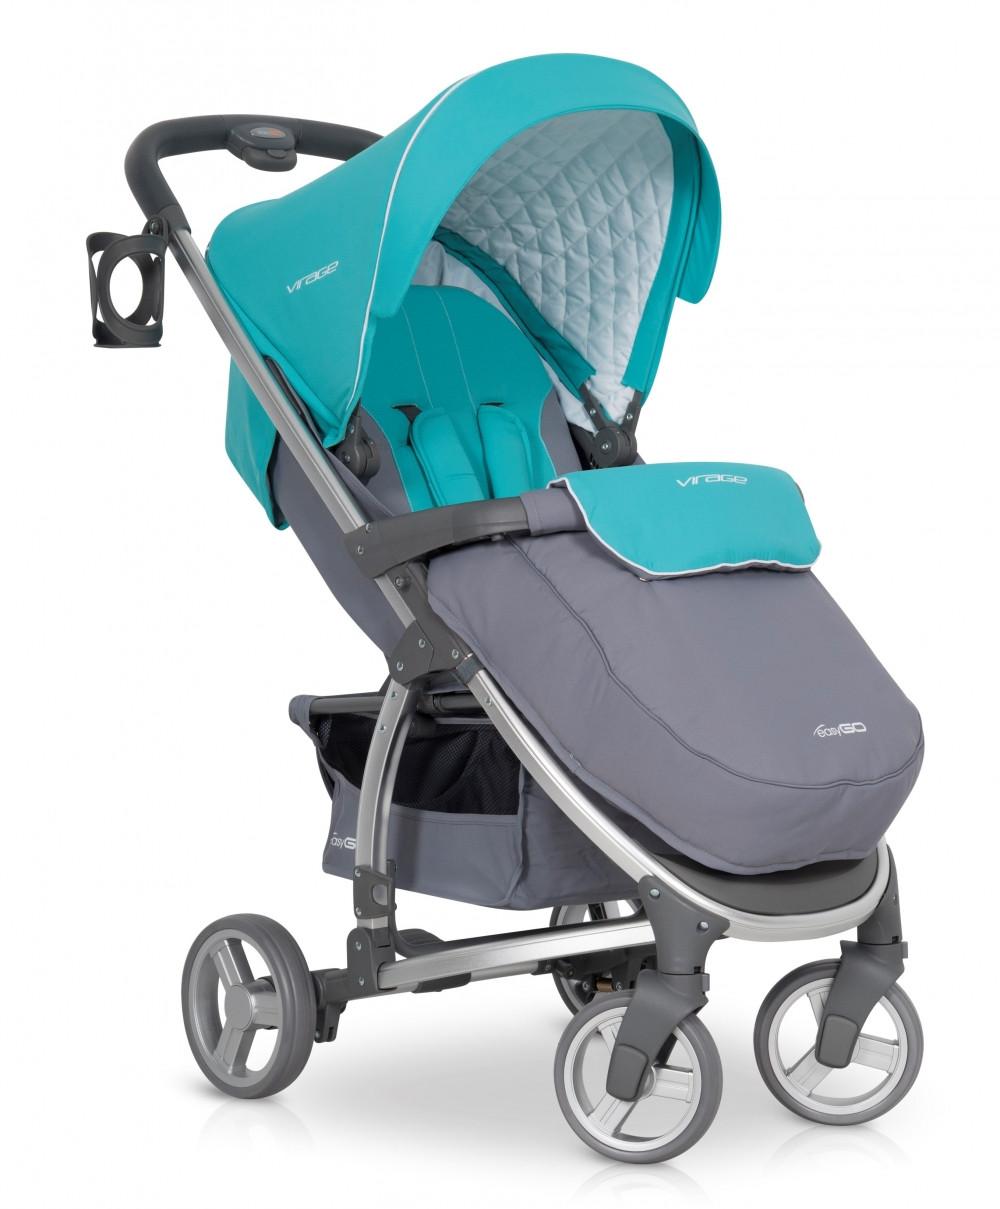 Детская прогулочная коляска EasyGo Virage malachite